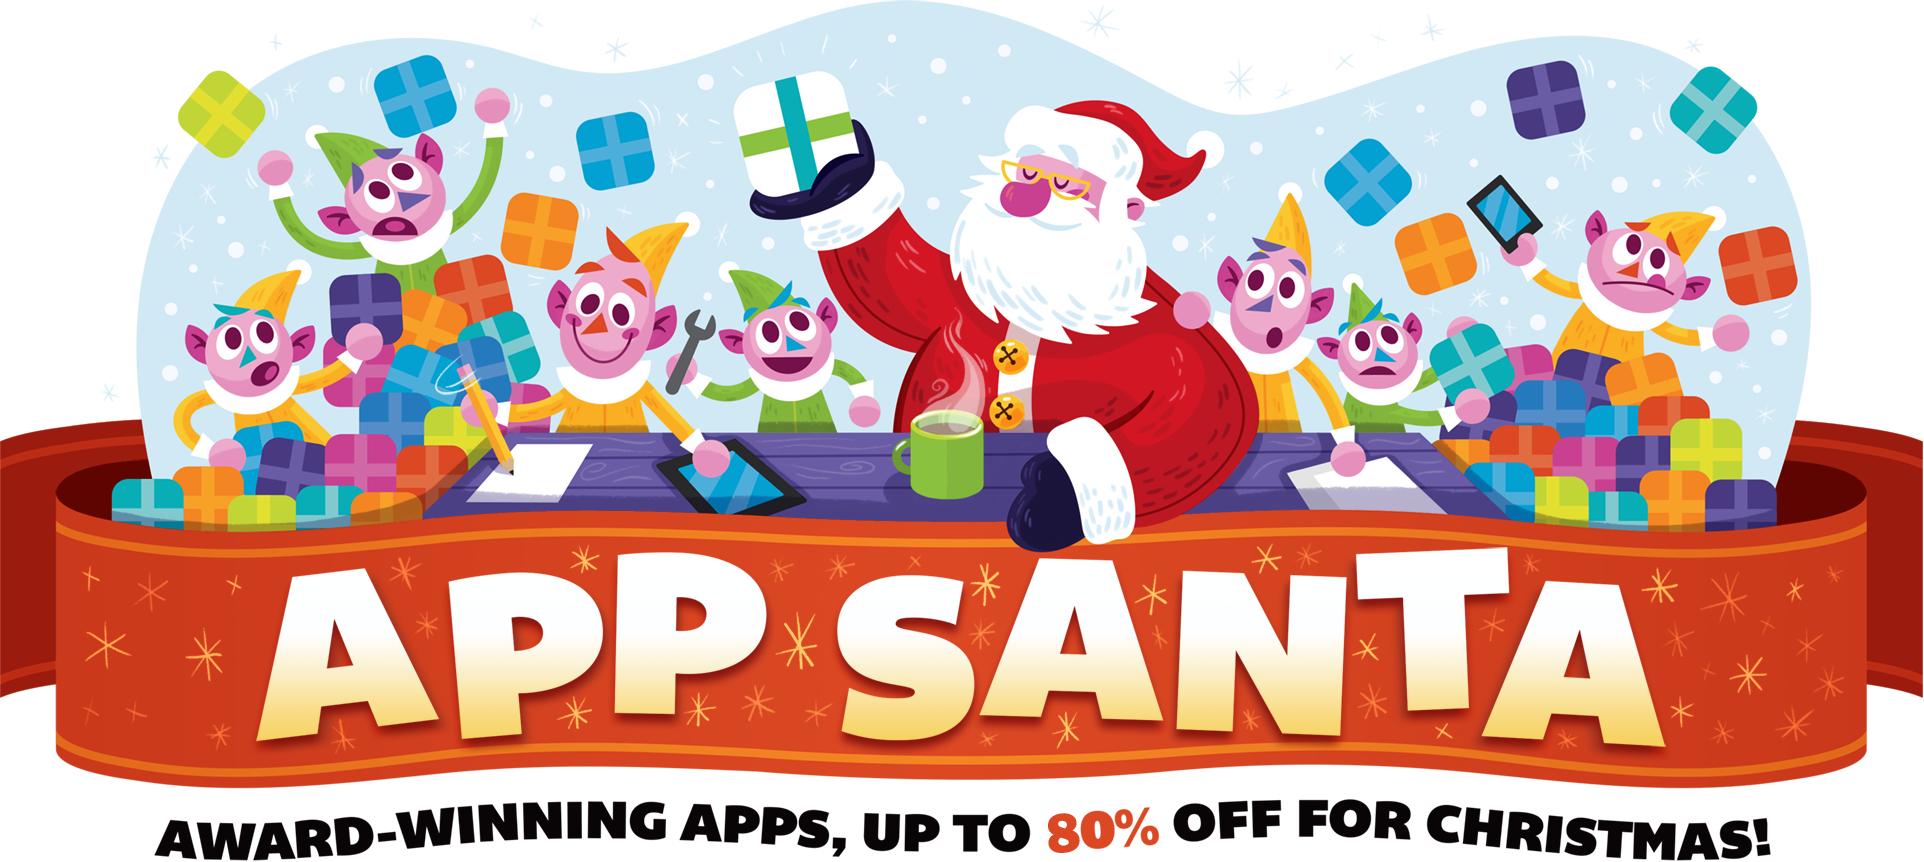 [iOS] [macOS] App Santa: App-Preise um bis zu 80% gesenkt